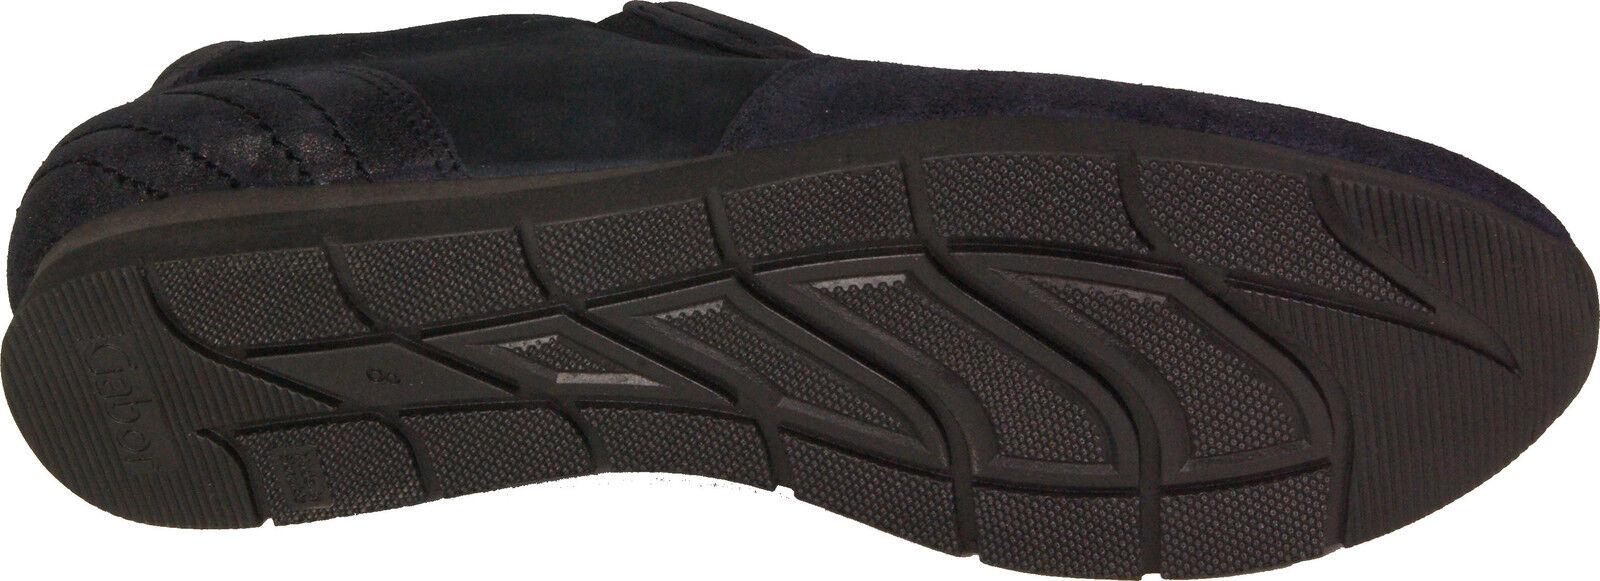 GABOR Schuhe Nubuk Slipper Sneaker Slip-Out`s blau Nubuk Schuhe Leder Wechselfußbett NEU e5ac31